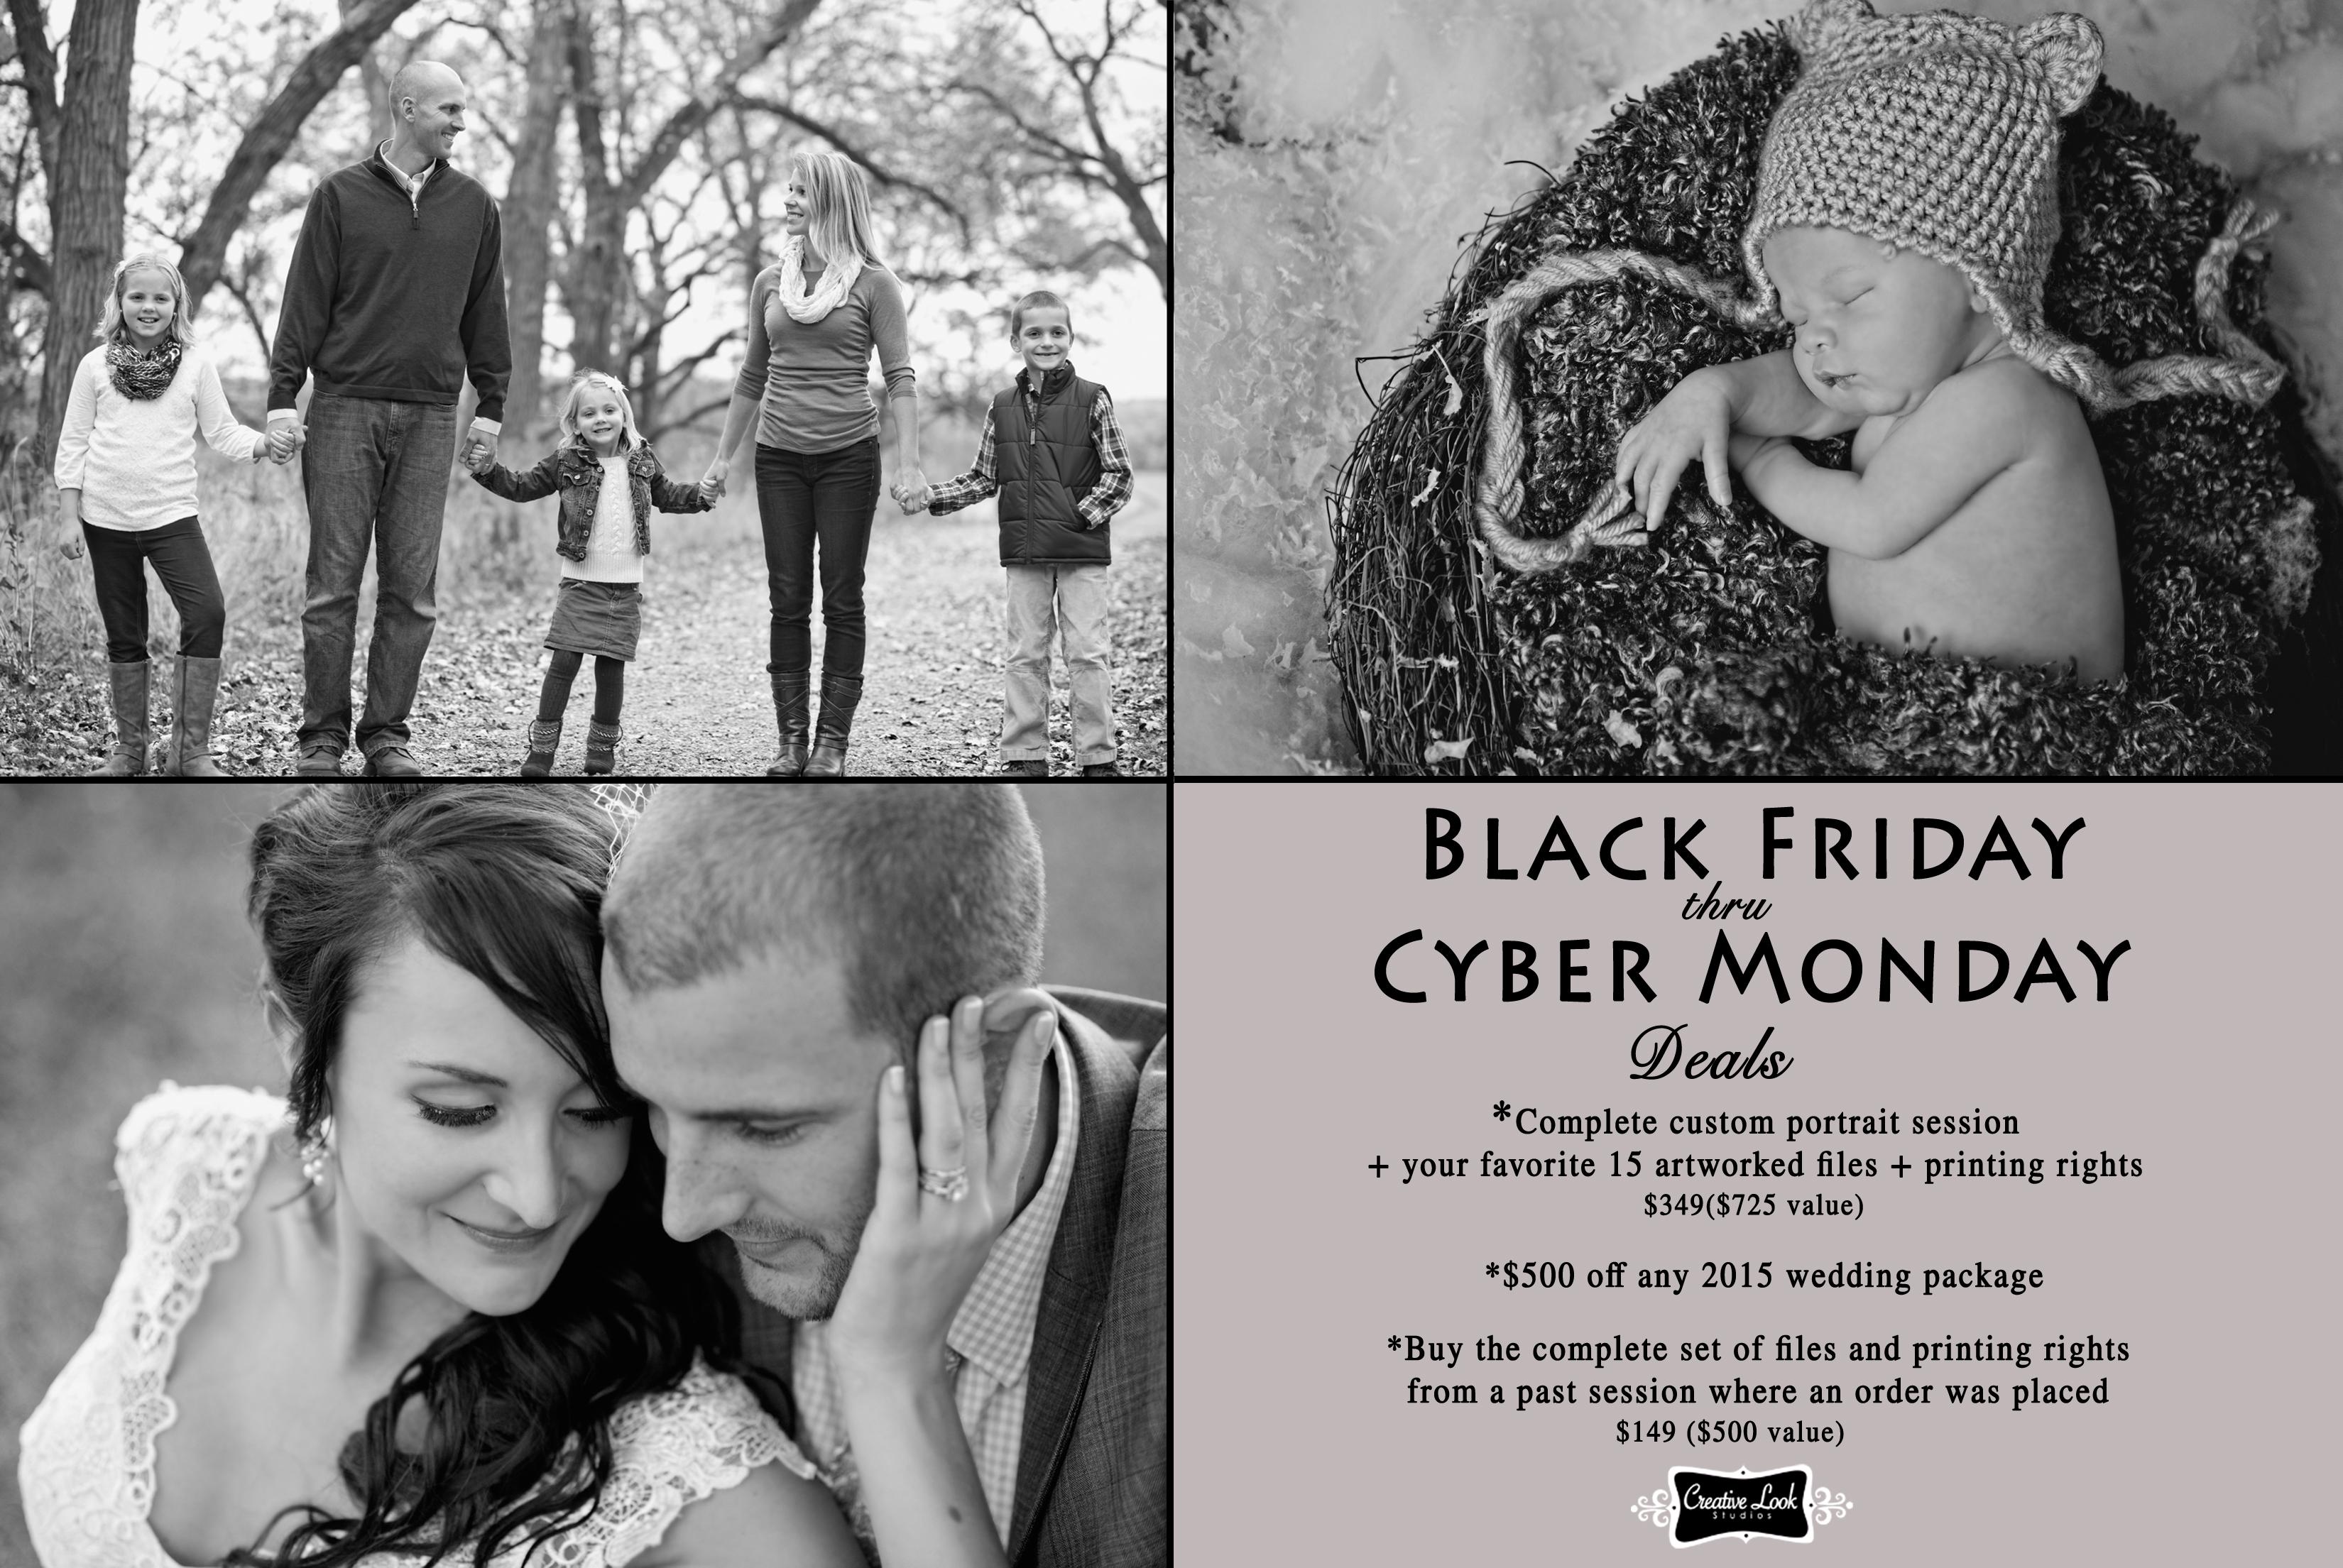 Black Friday Cyber Monday Photography Deal Middelton Wi Photographer Creative Look Studios